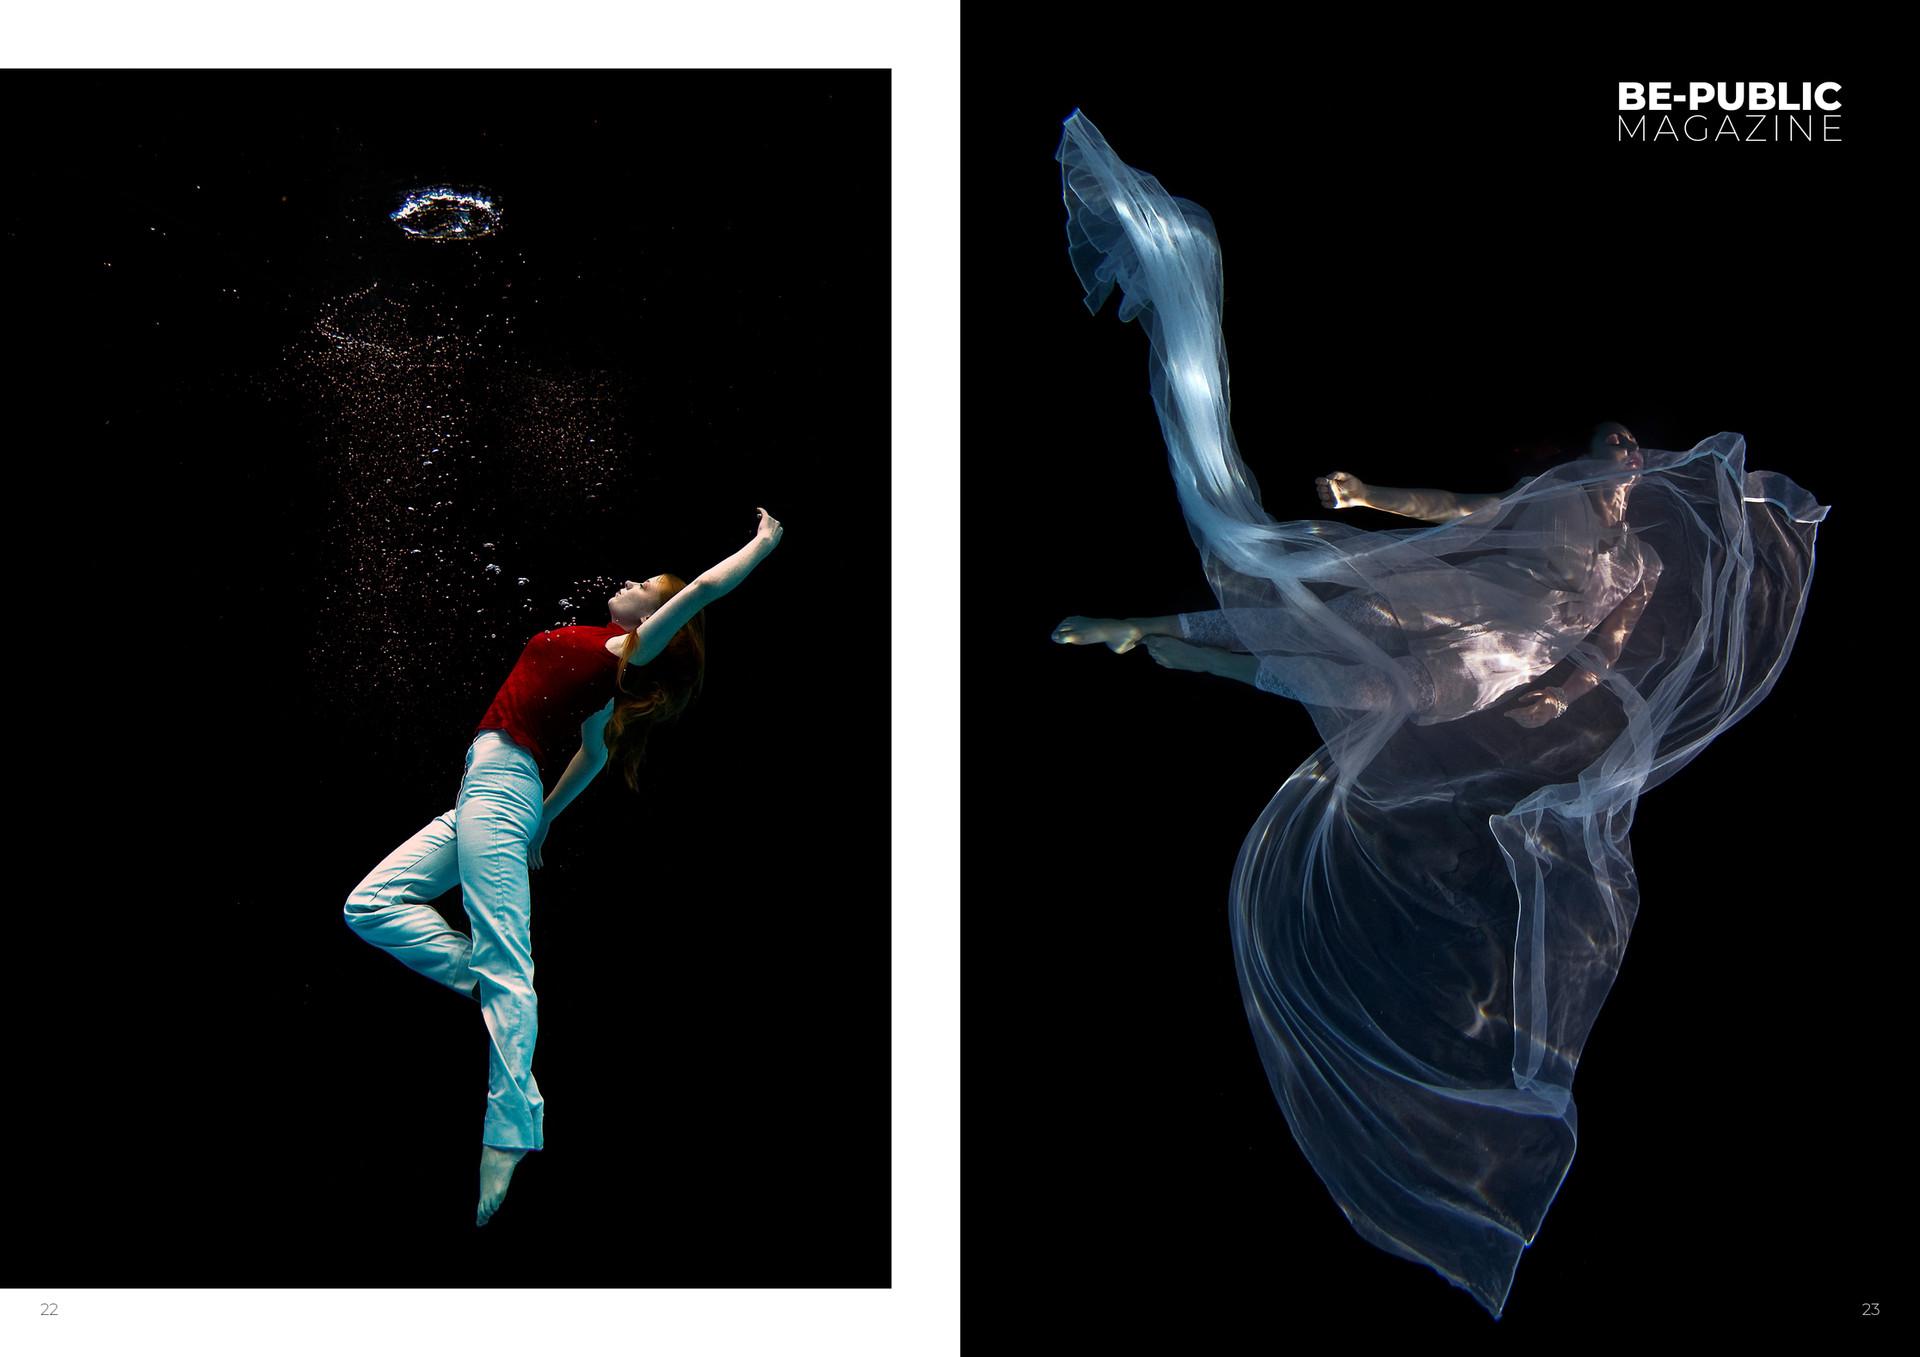 Underwater_časopis